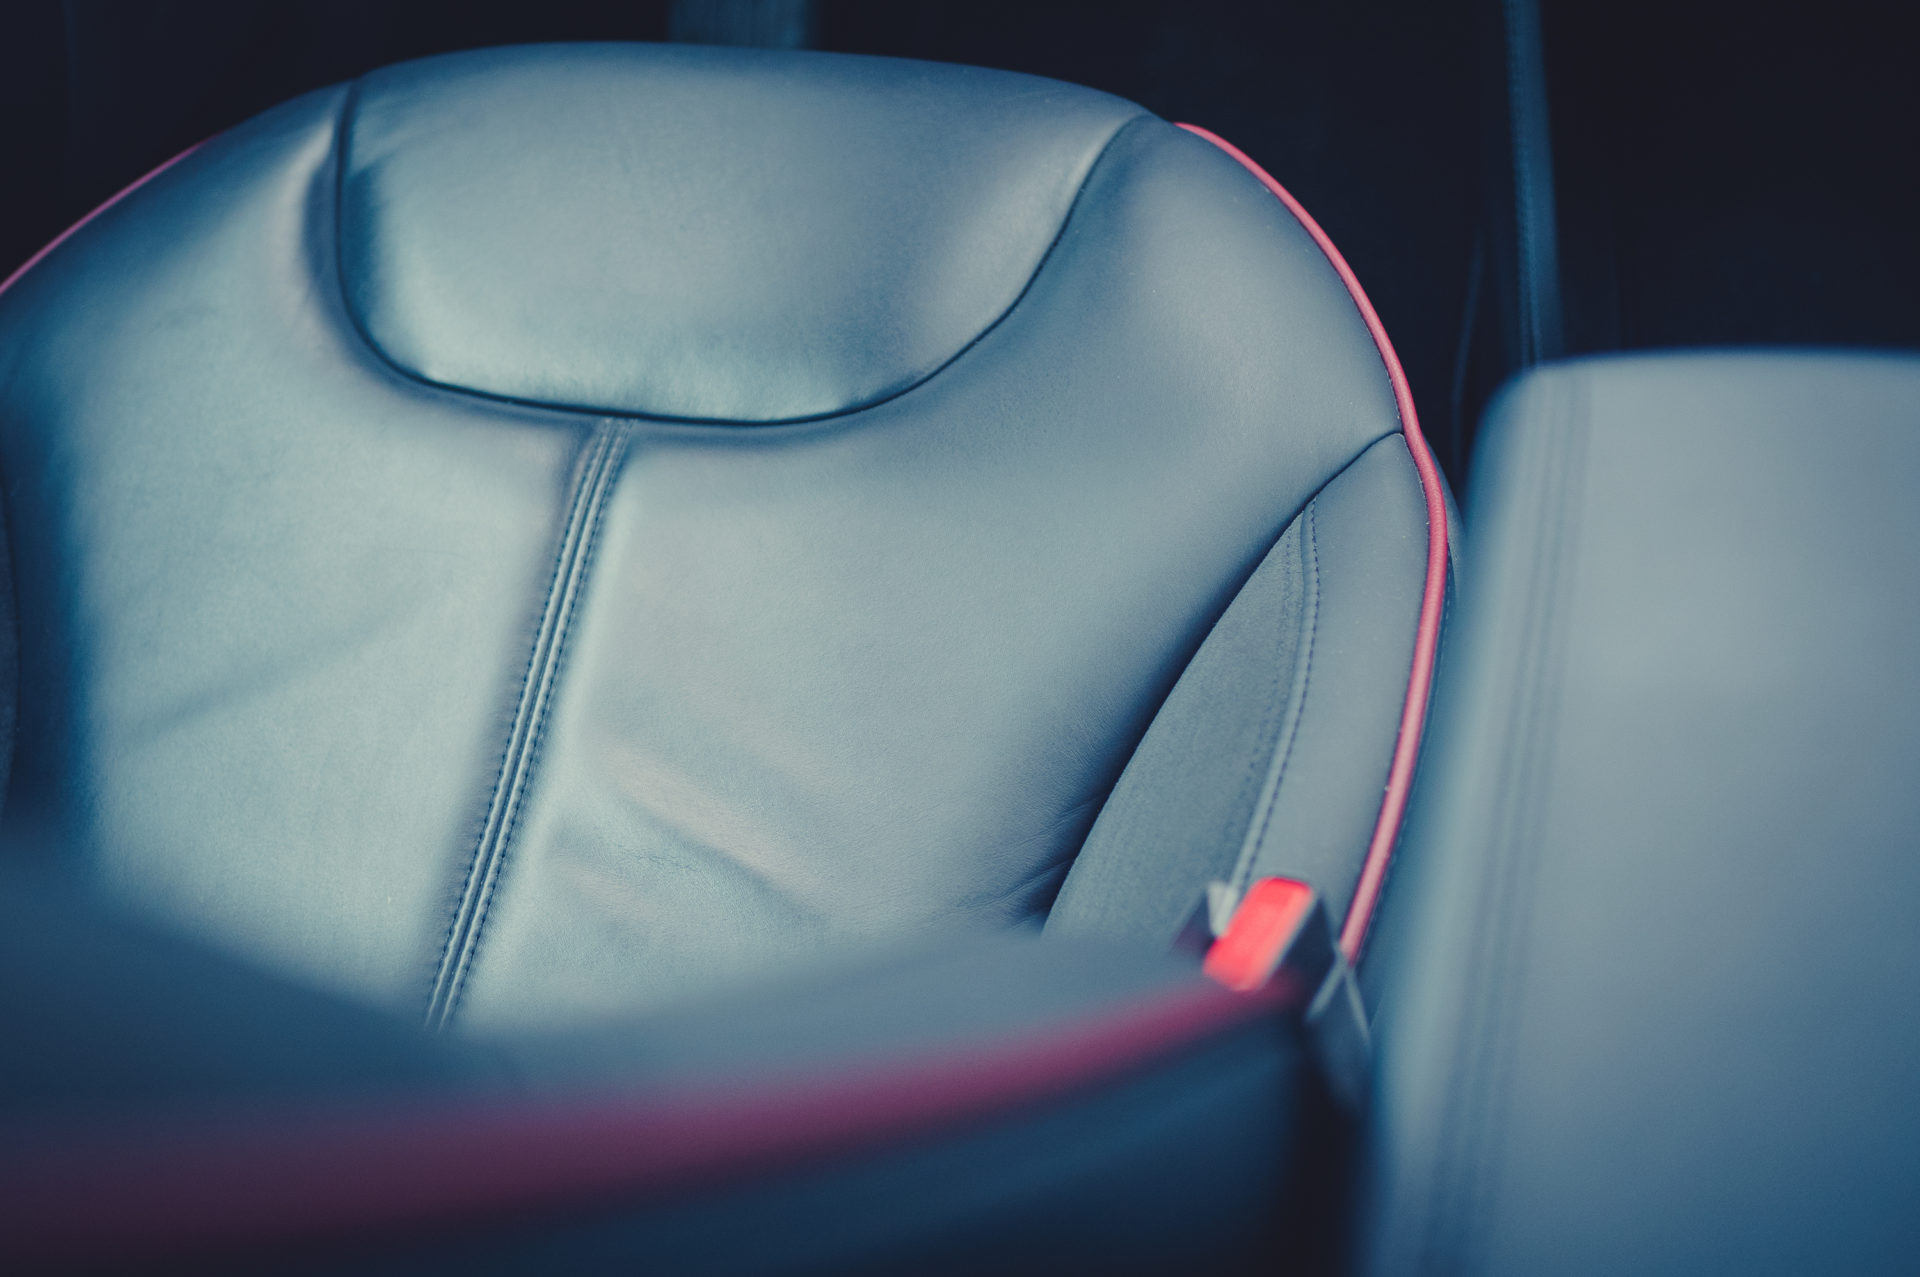 Tesla Model S85 rot multicoat Interieur Sitze Ledersitze performance seats Leistungssitze Alcantara rote Ziernähte Greenspeed Elektroauto emobility Aachen NRW Deutschland